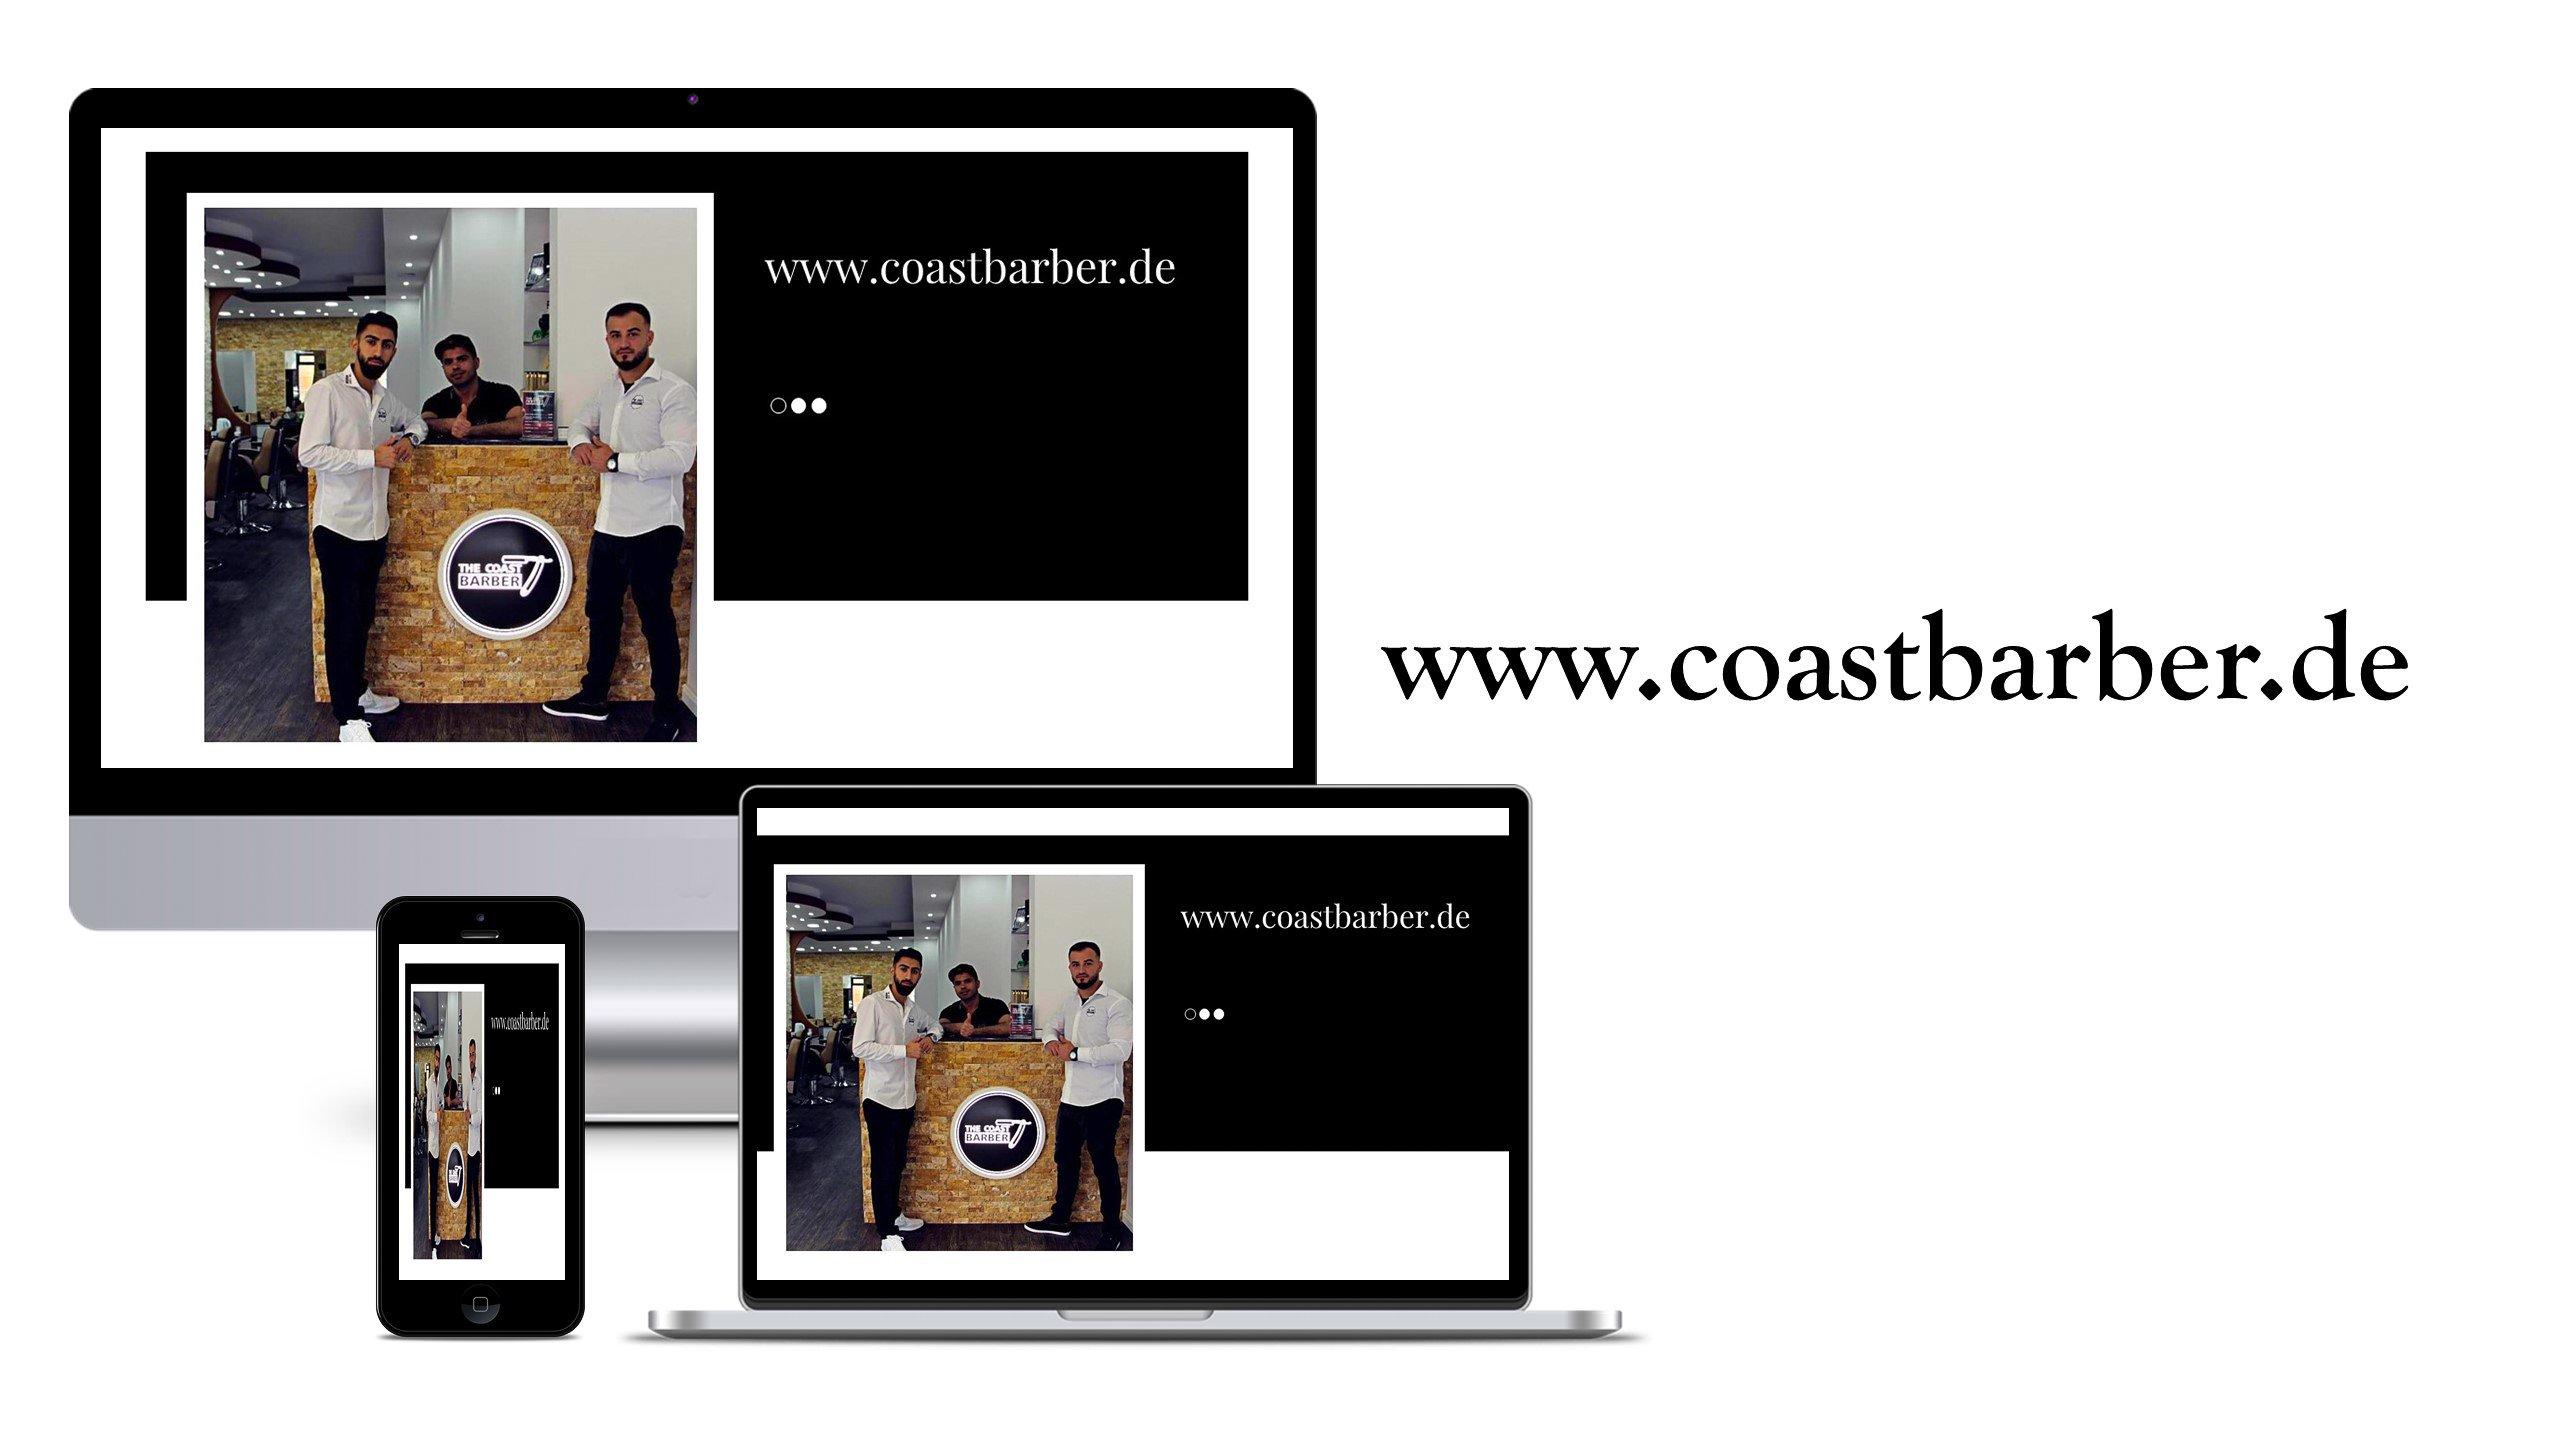 Referenz-The-Coast-Barber